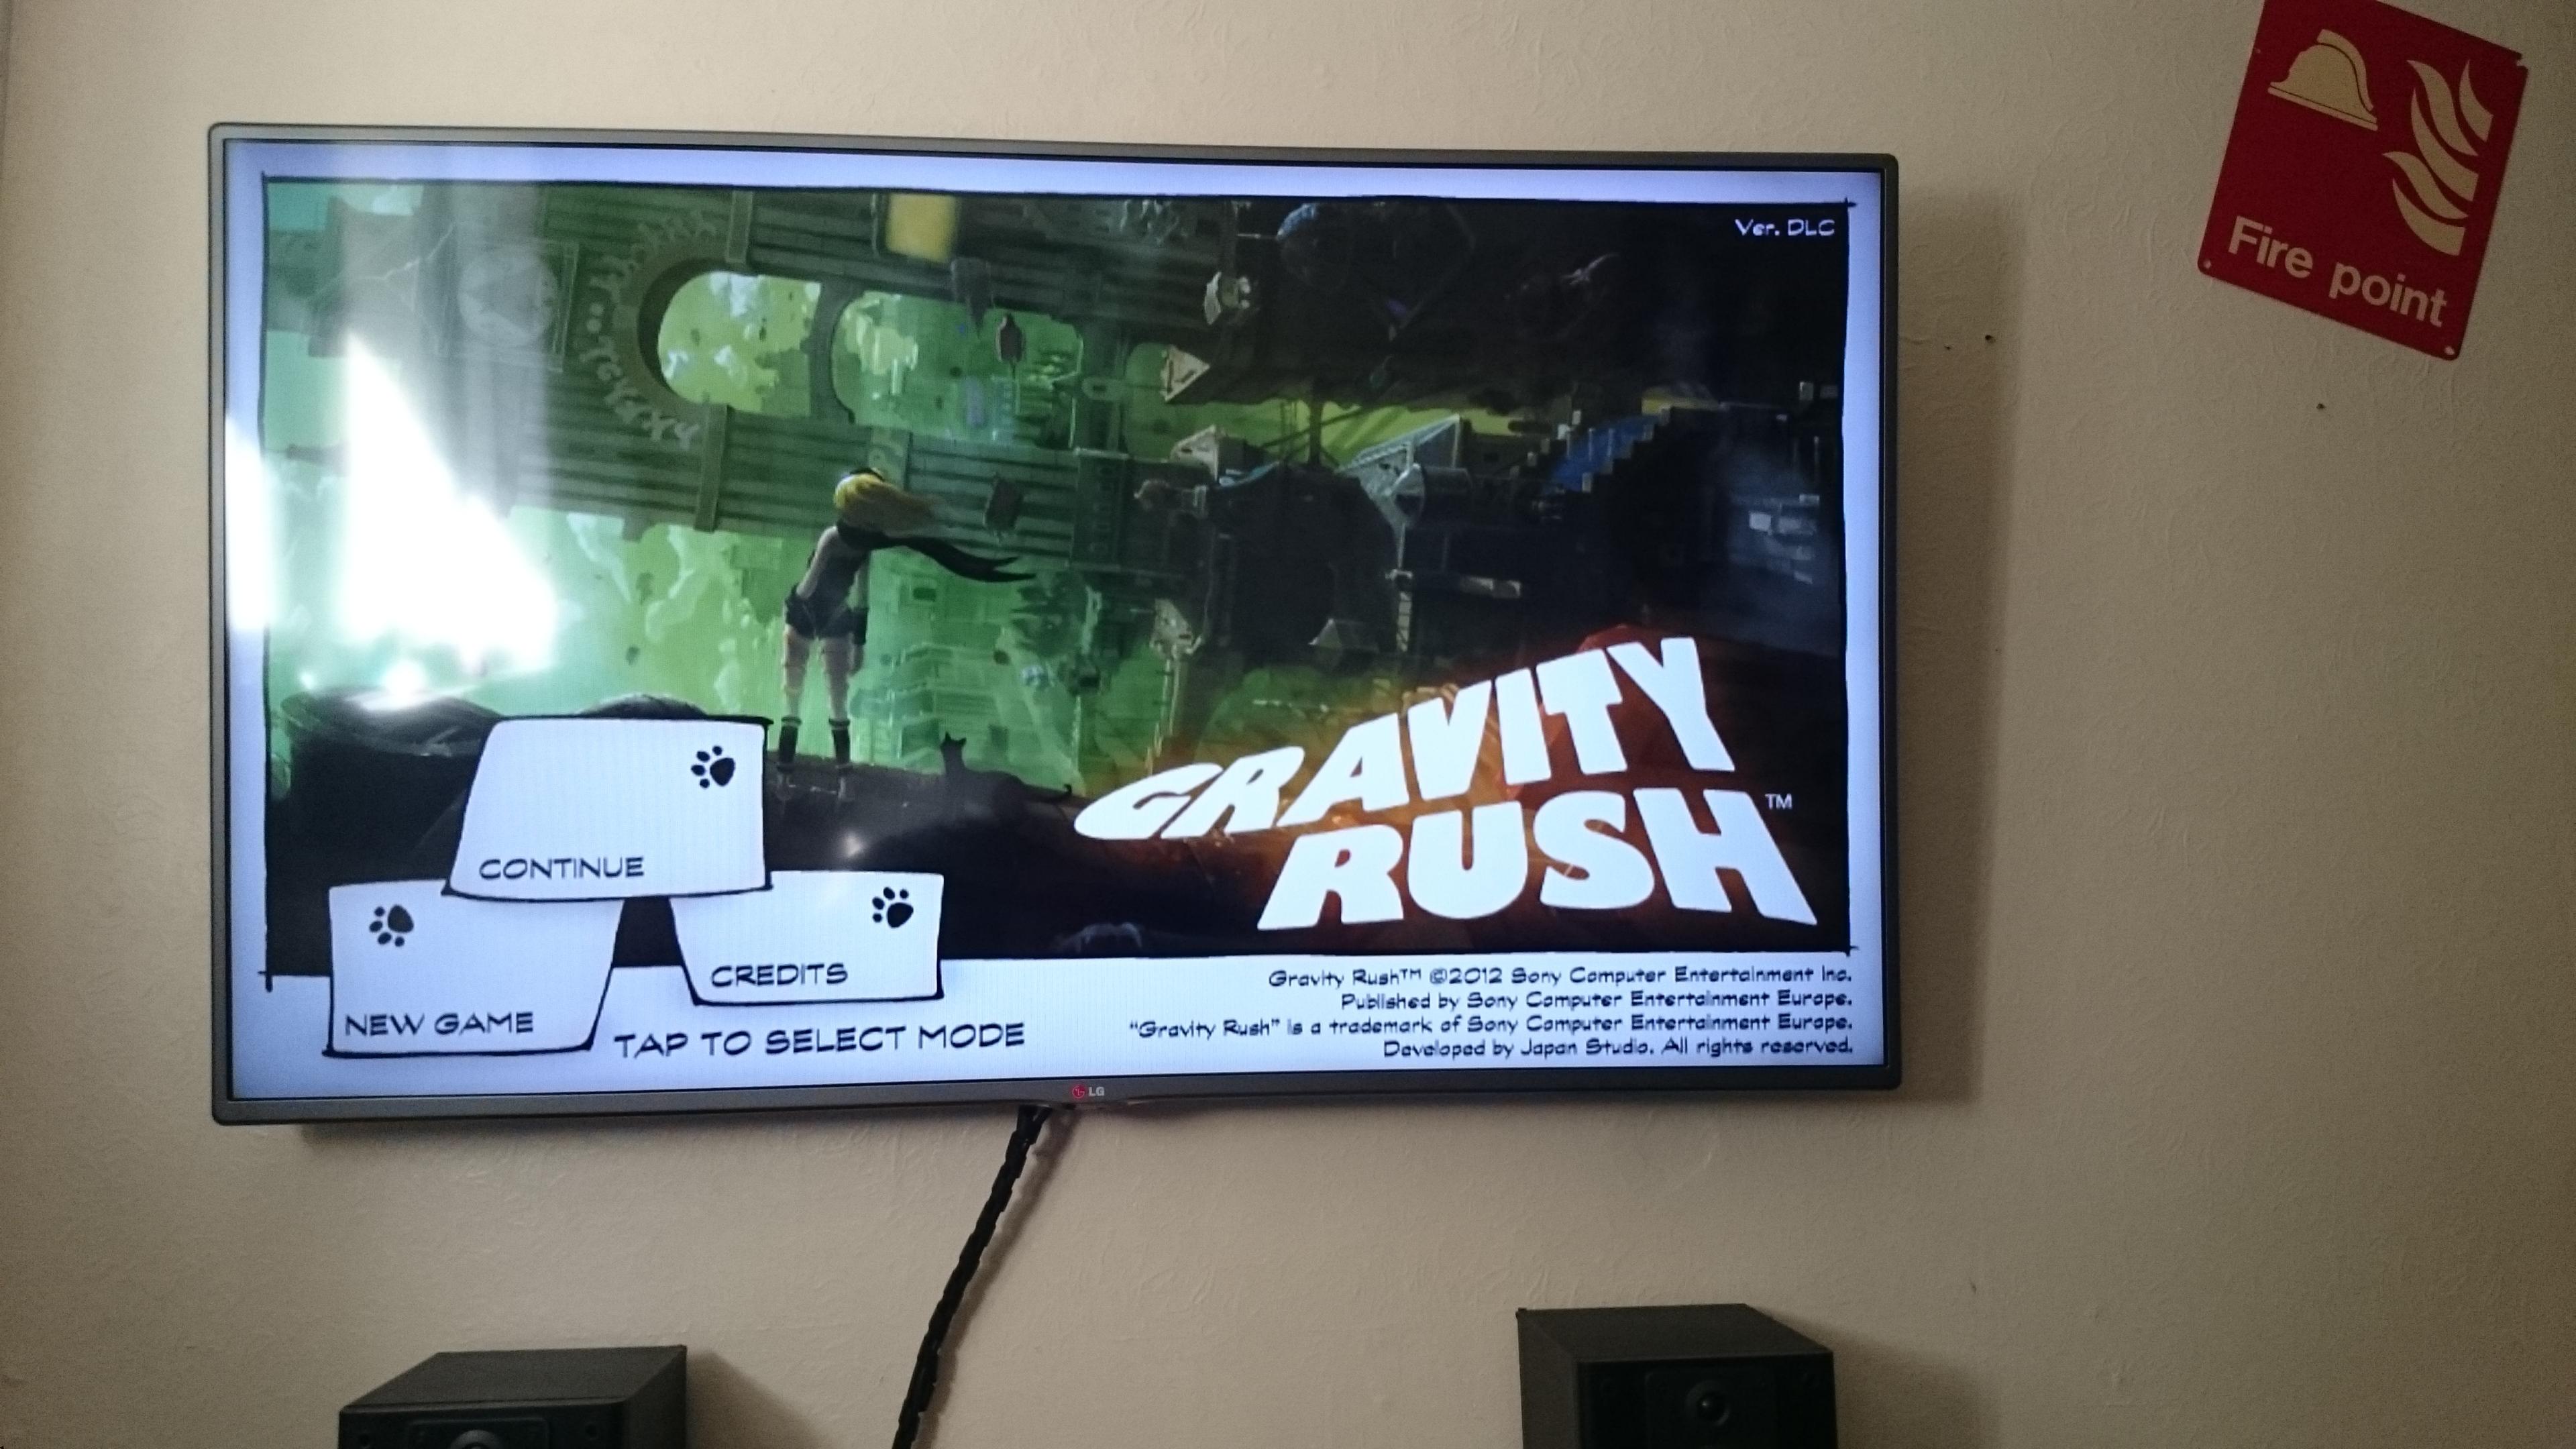 Programa 9x02 (25-09-15) 'Metal Gear Splod V The Phantom Pain'  - Página 2 Dsc_0046g4spt